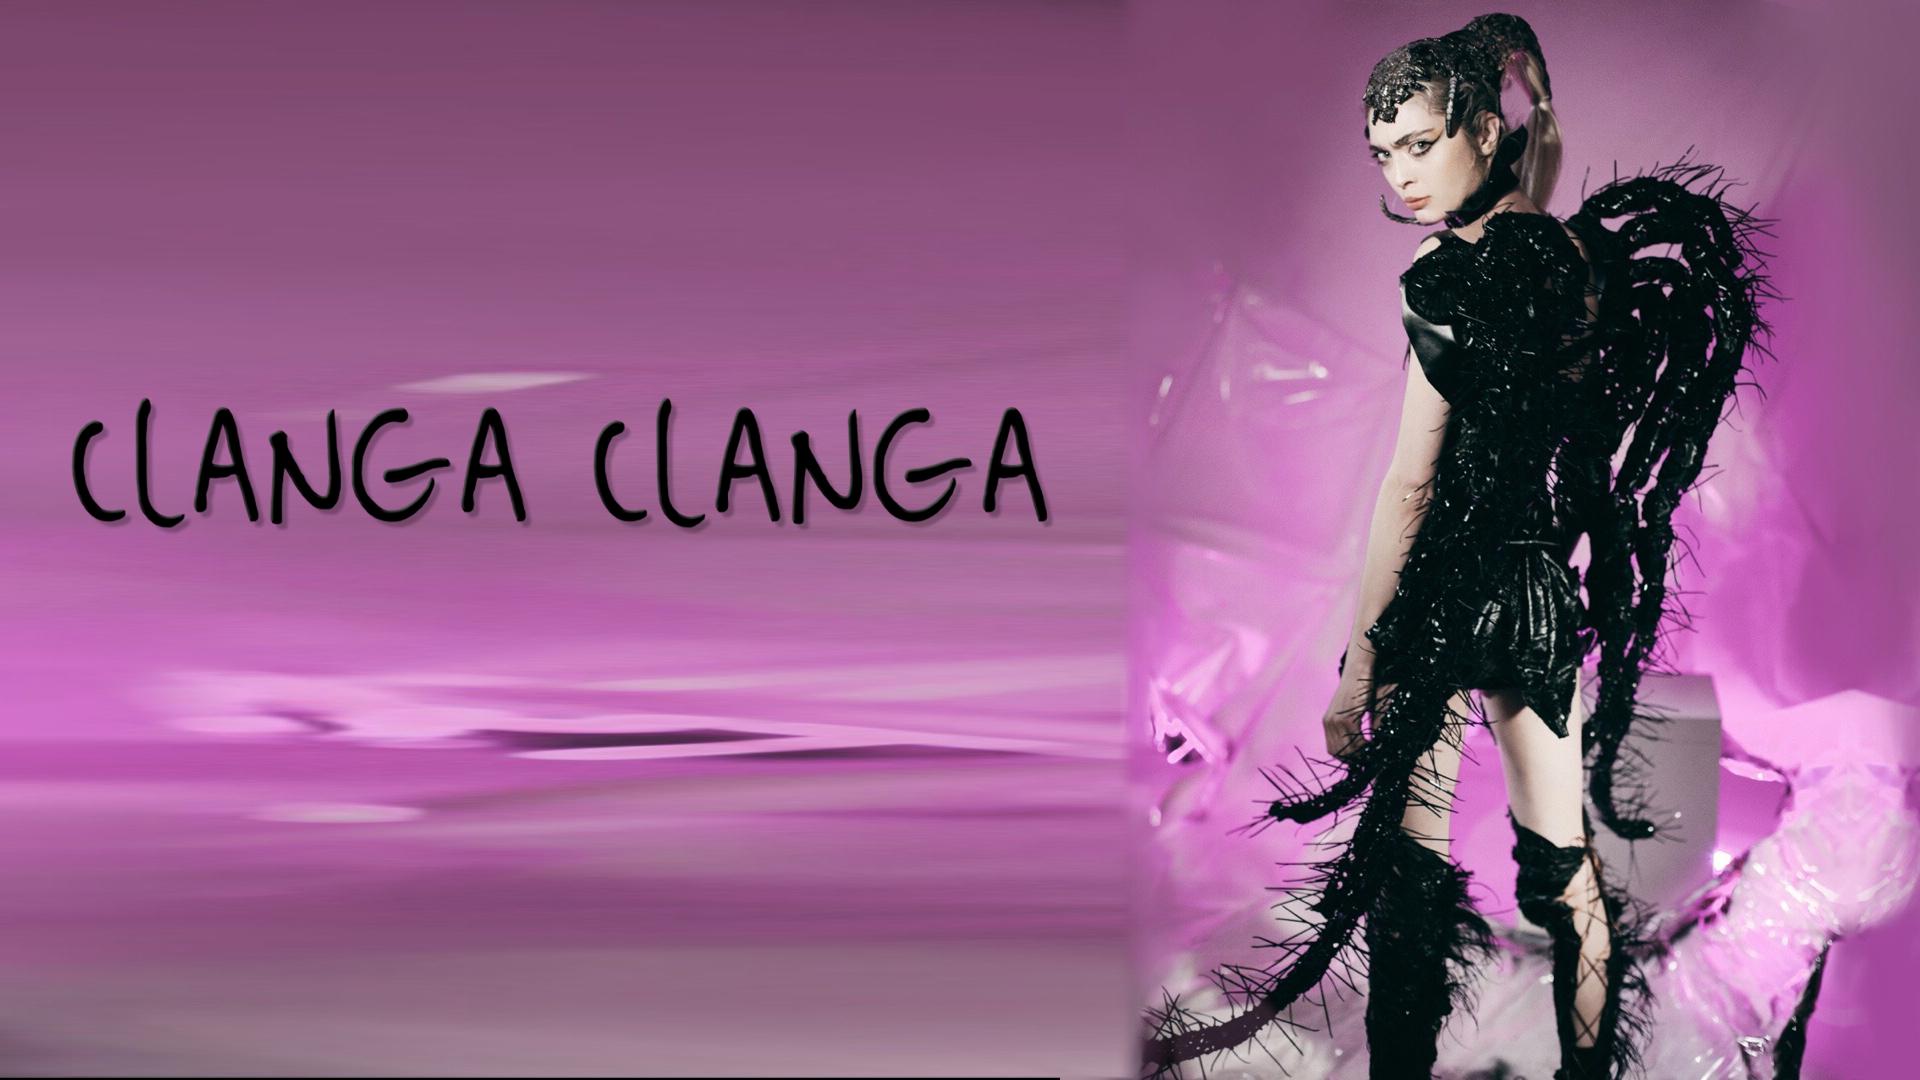 sarlatan_cristina milea_clanga clanga_upcycled fashion